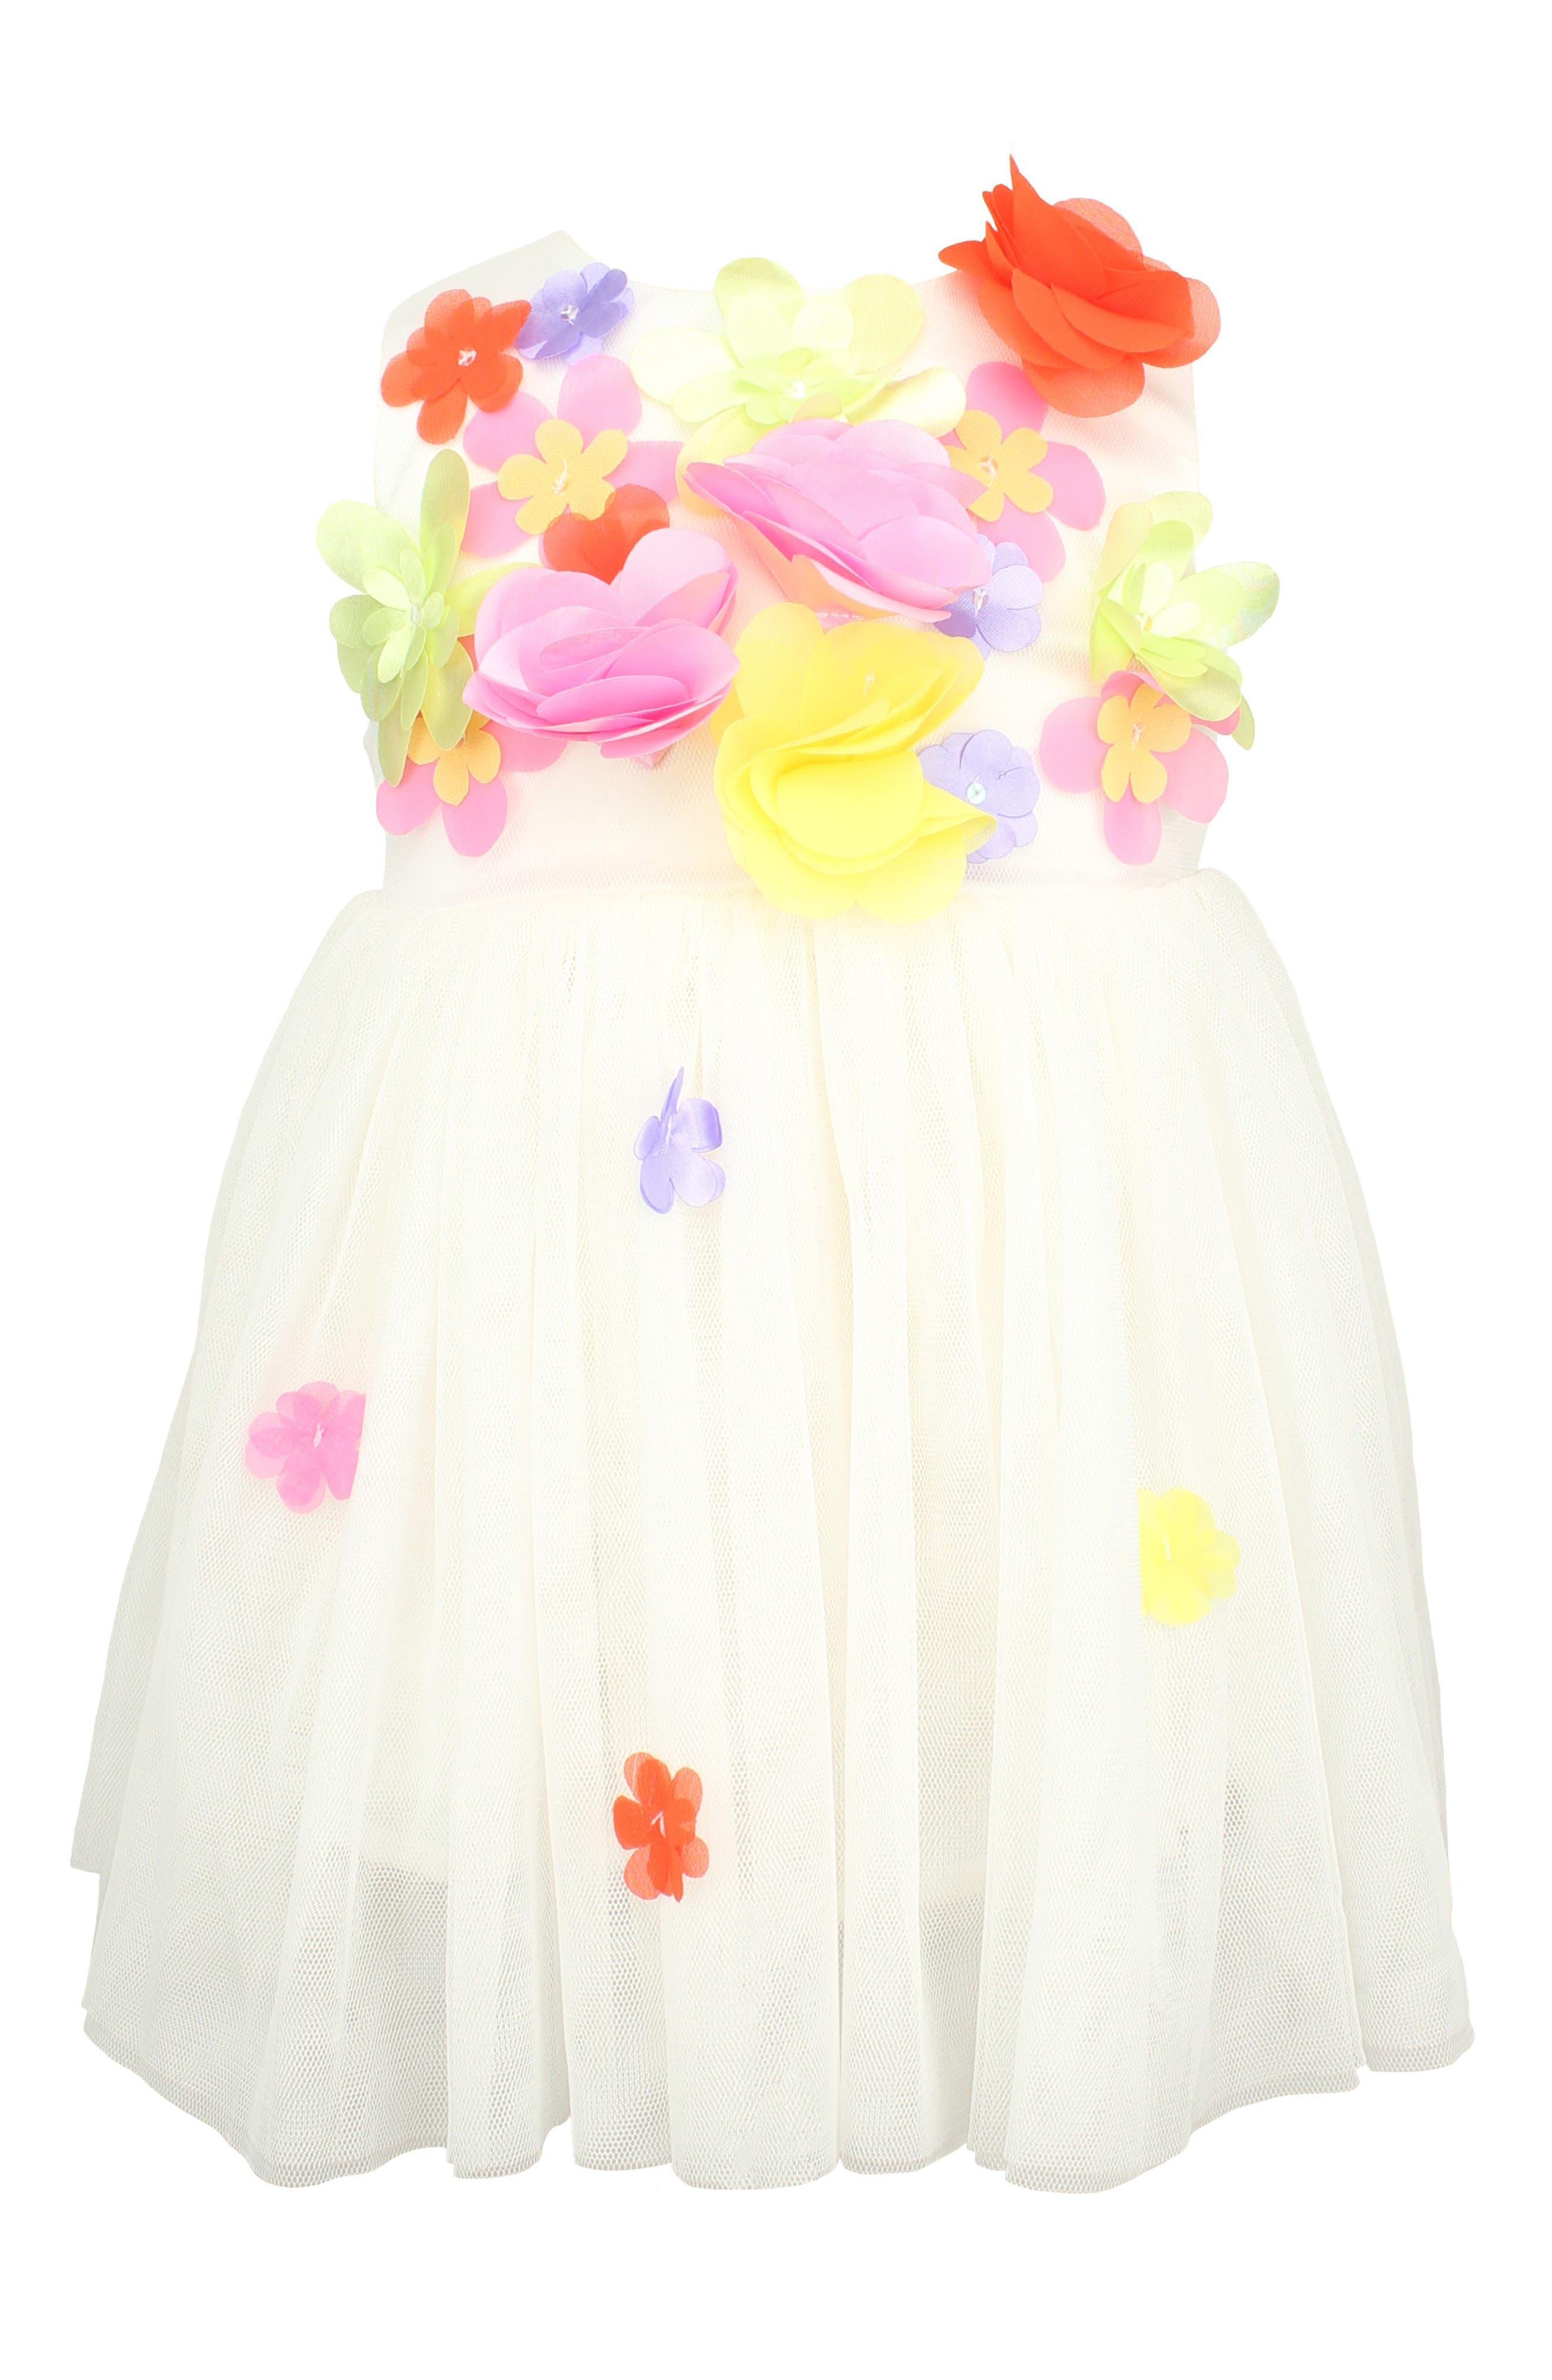 POPATU, Floral Sleeveless Dress, Main thumbnail 1, color, WHITE